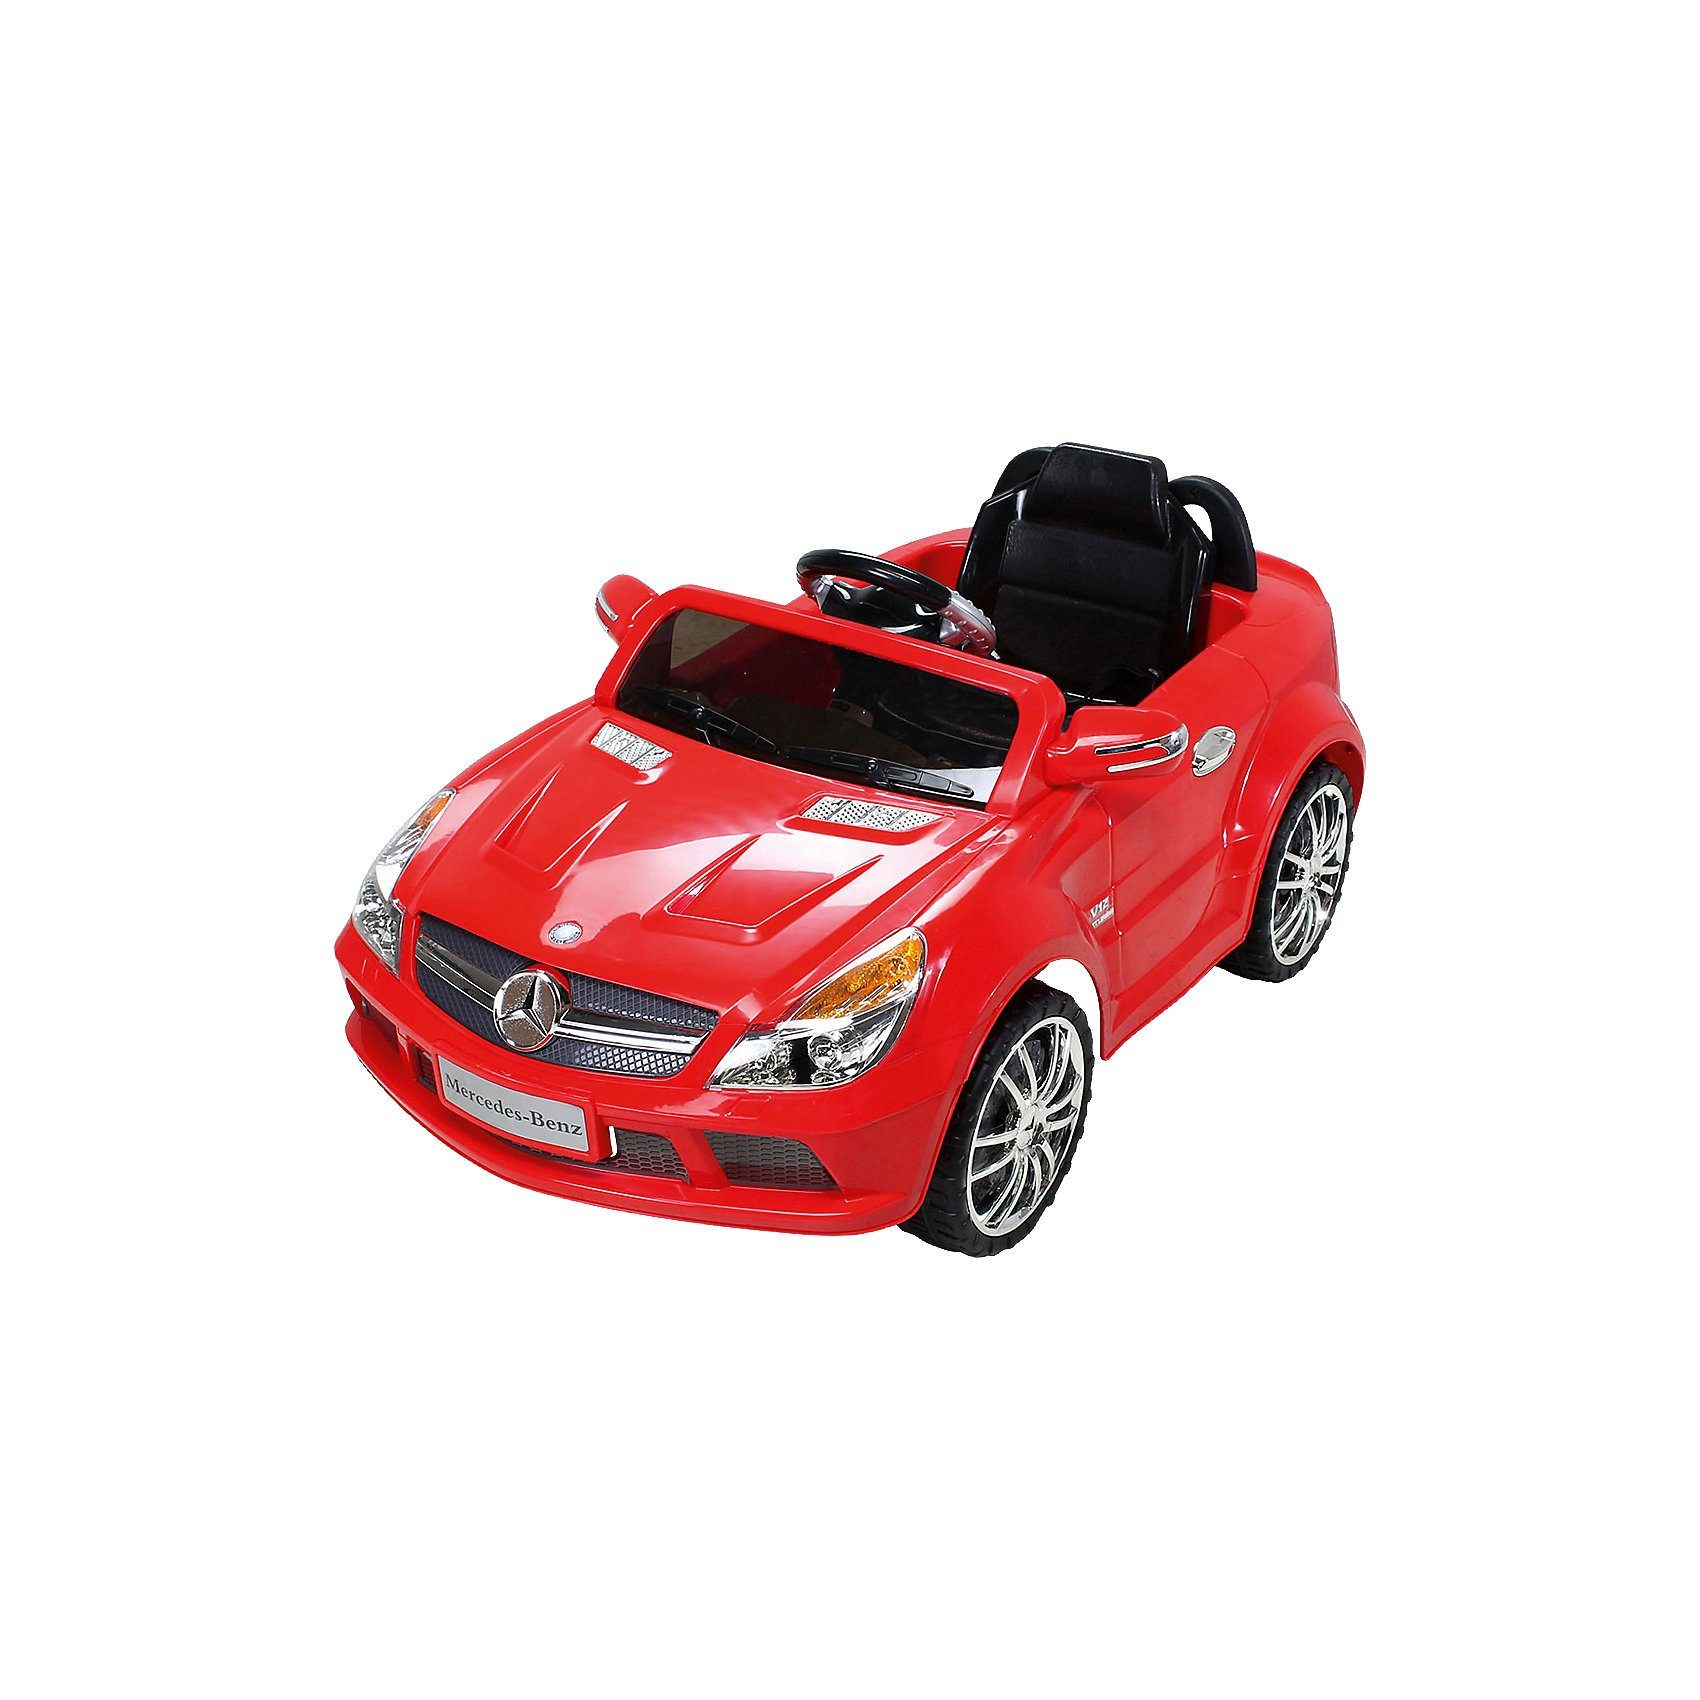 miweba Kinder Elektroauto Mercedes SL65 AMG Lizenziert, rot